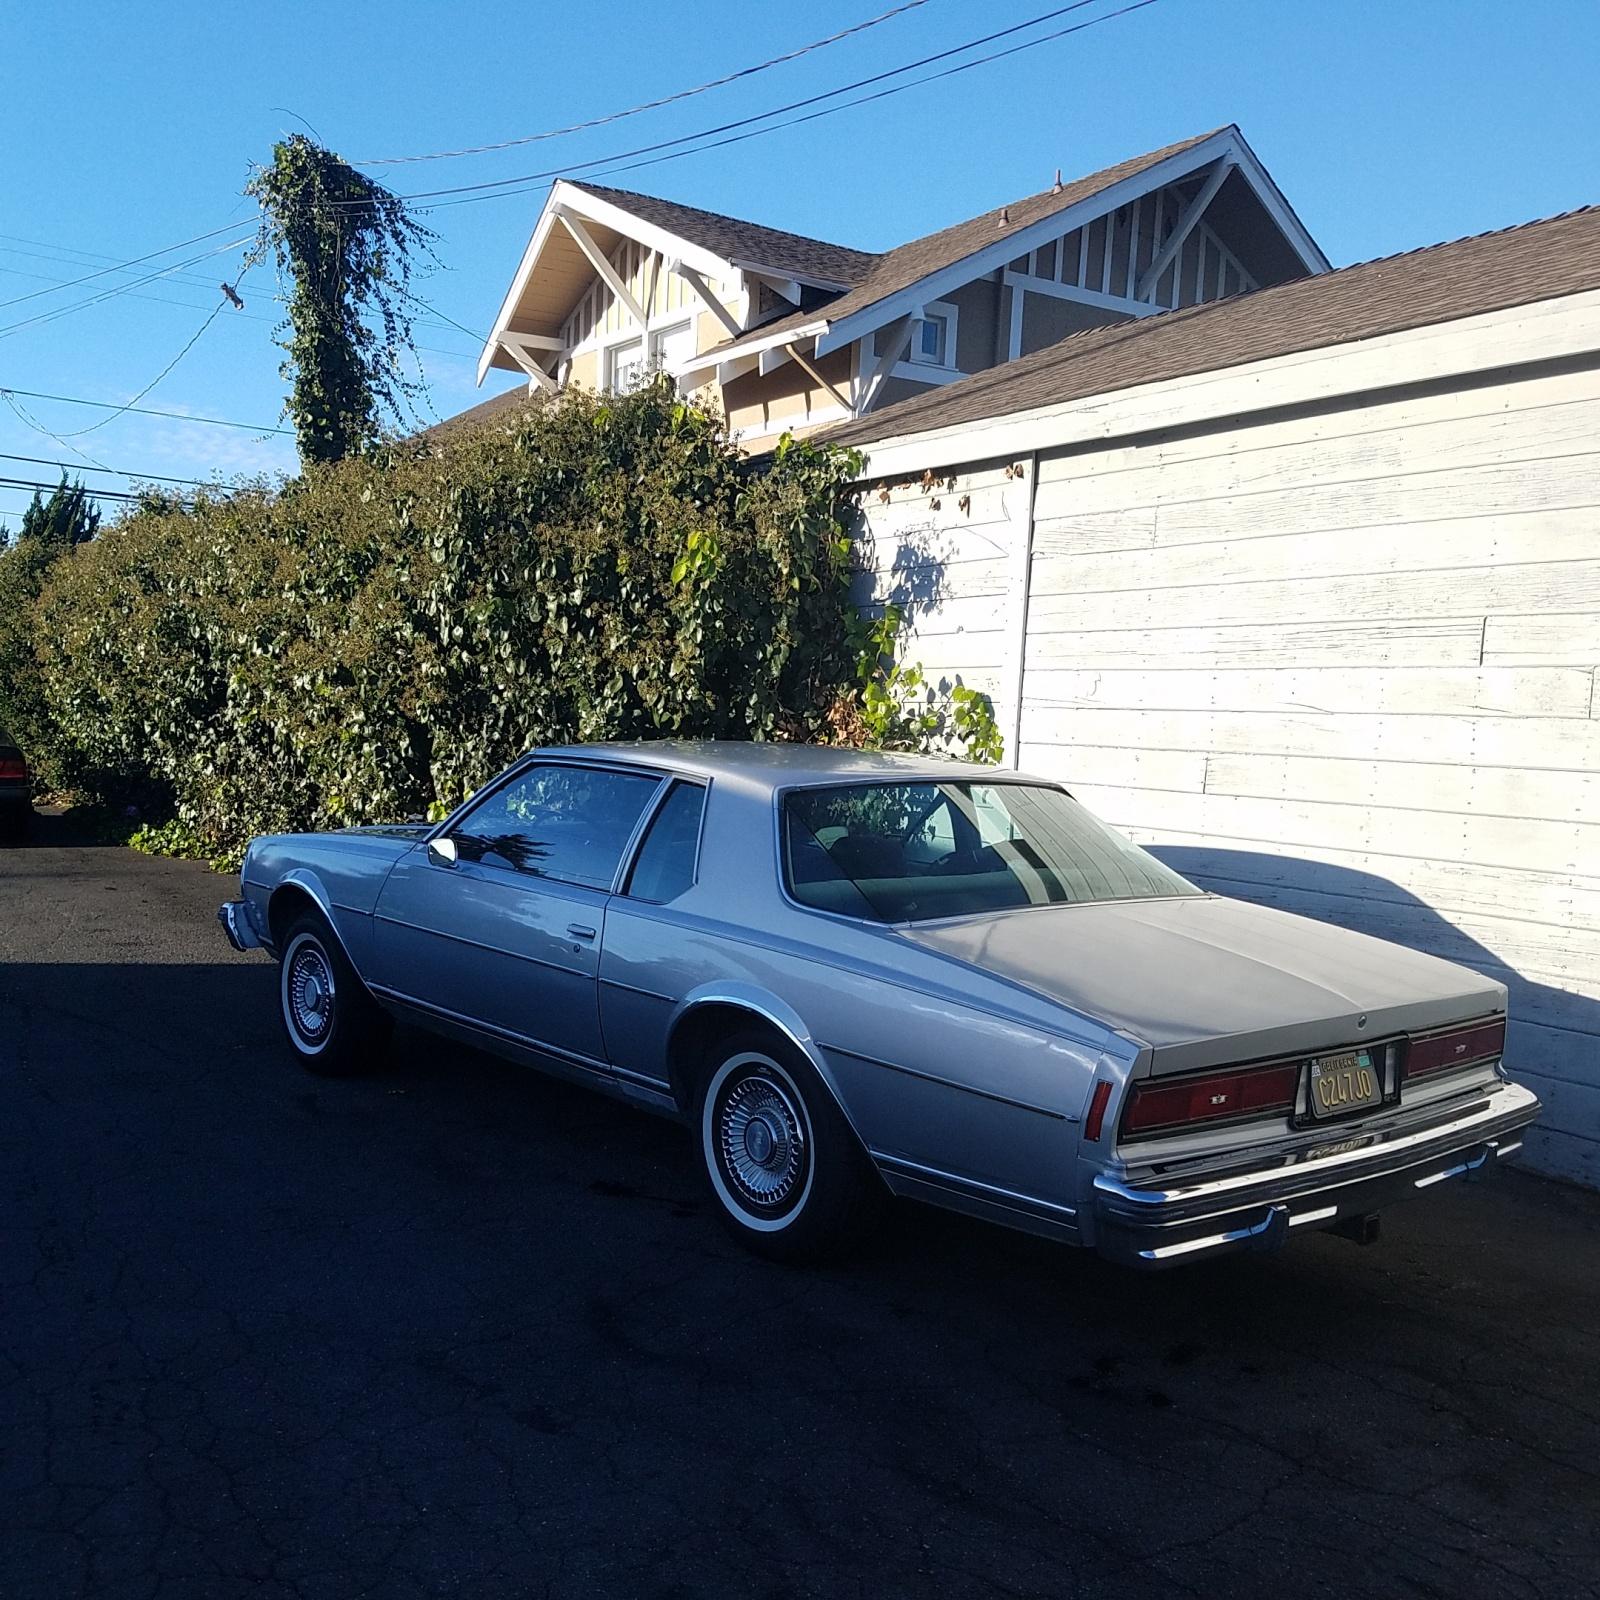 La Craigslist Cars: $3,500 2-Door: 1977 Chevrolet Caprice Classic